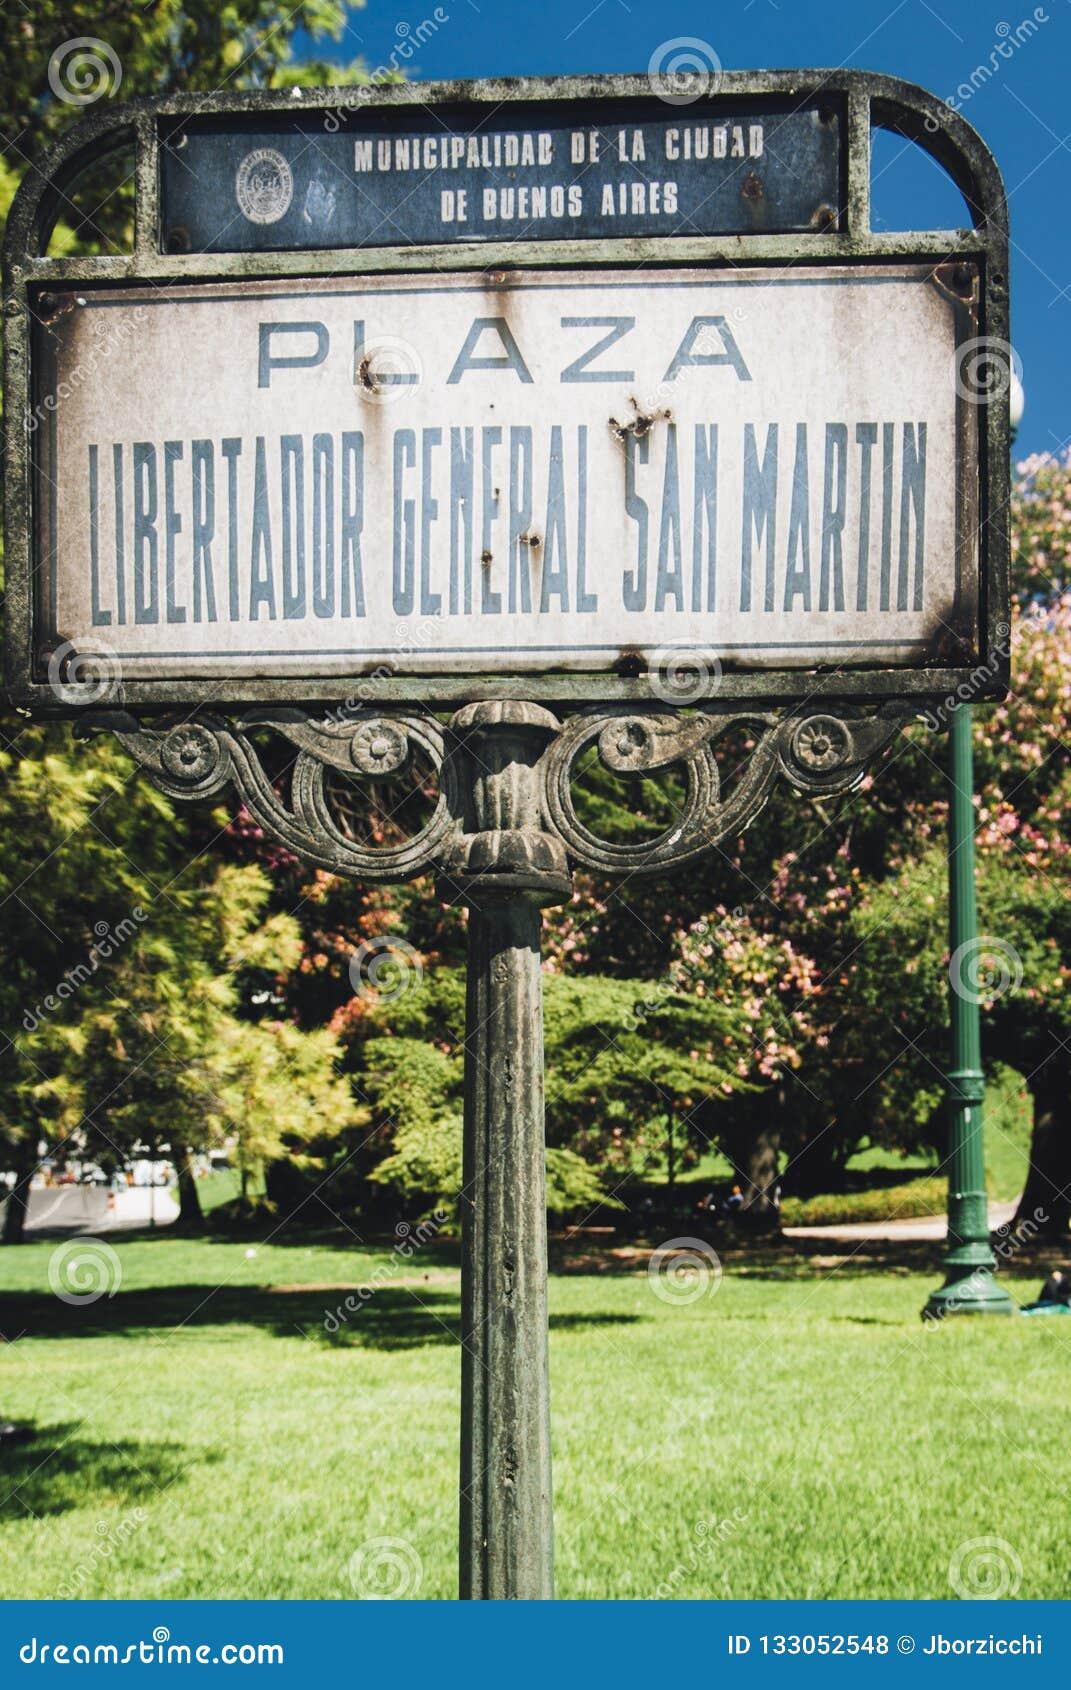 Plaza Libertador General San Martin, Buenos Aires, Argentina